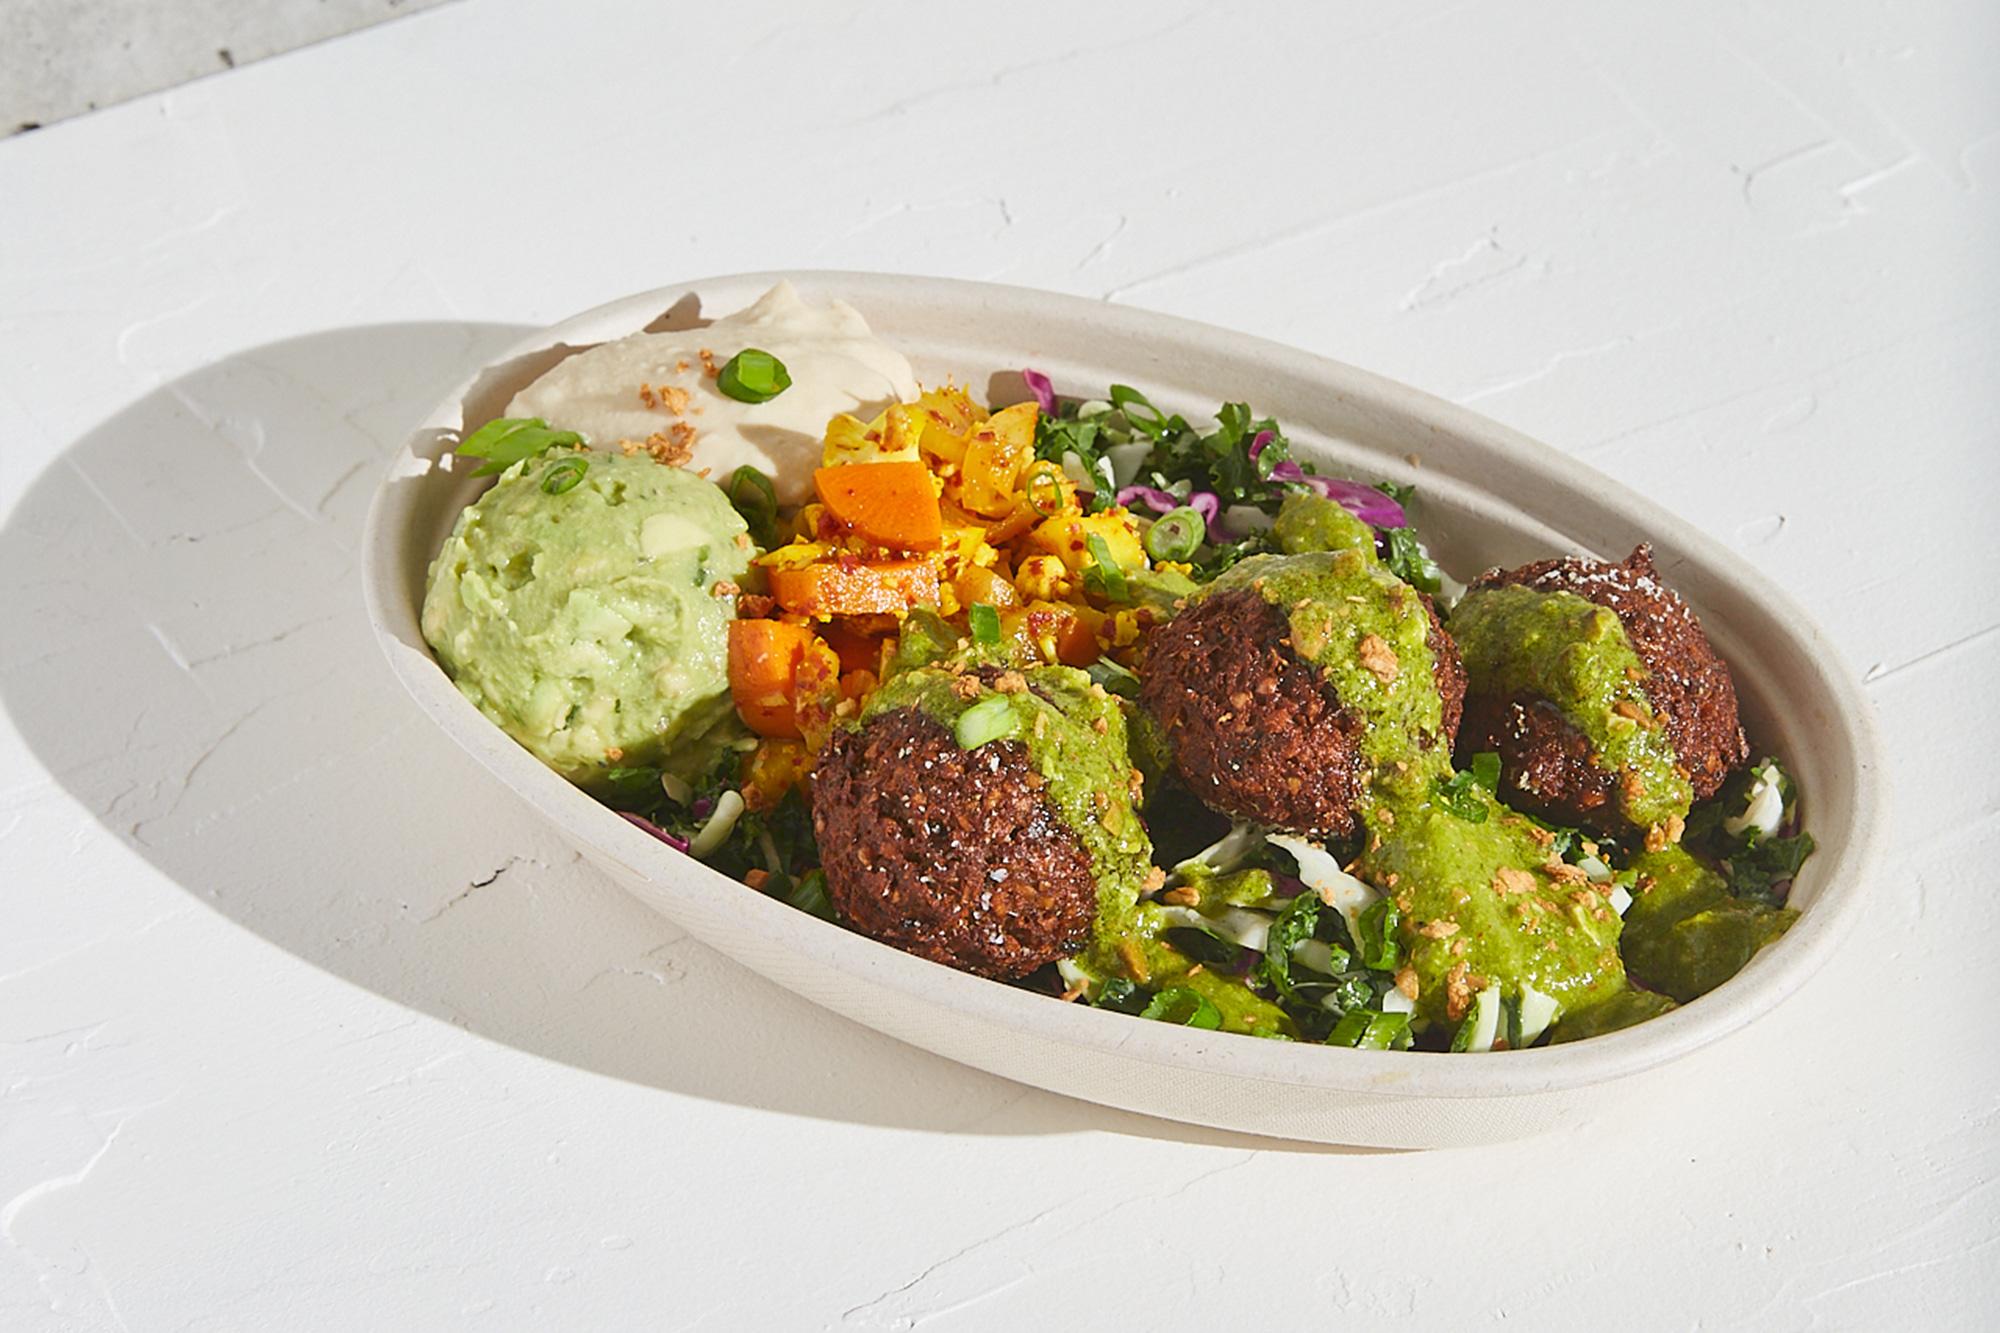 Vegetarian, Vegan, Paleo and Gluten-Free Bols